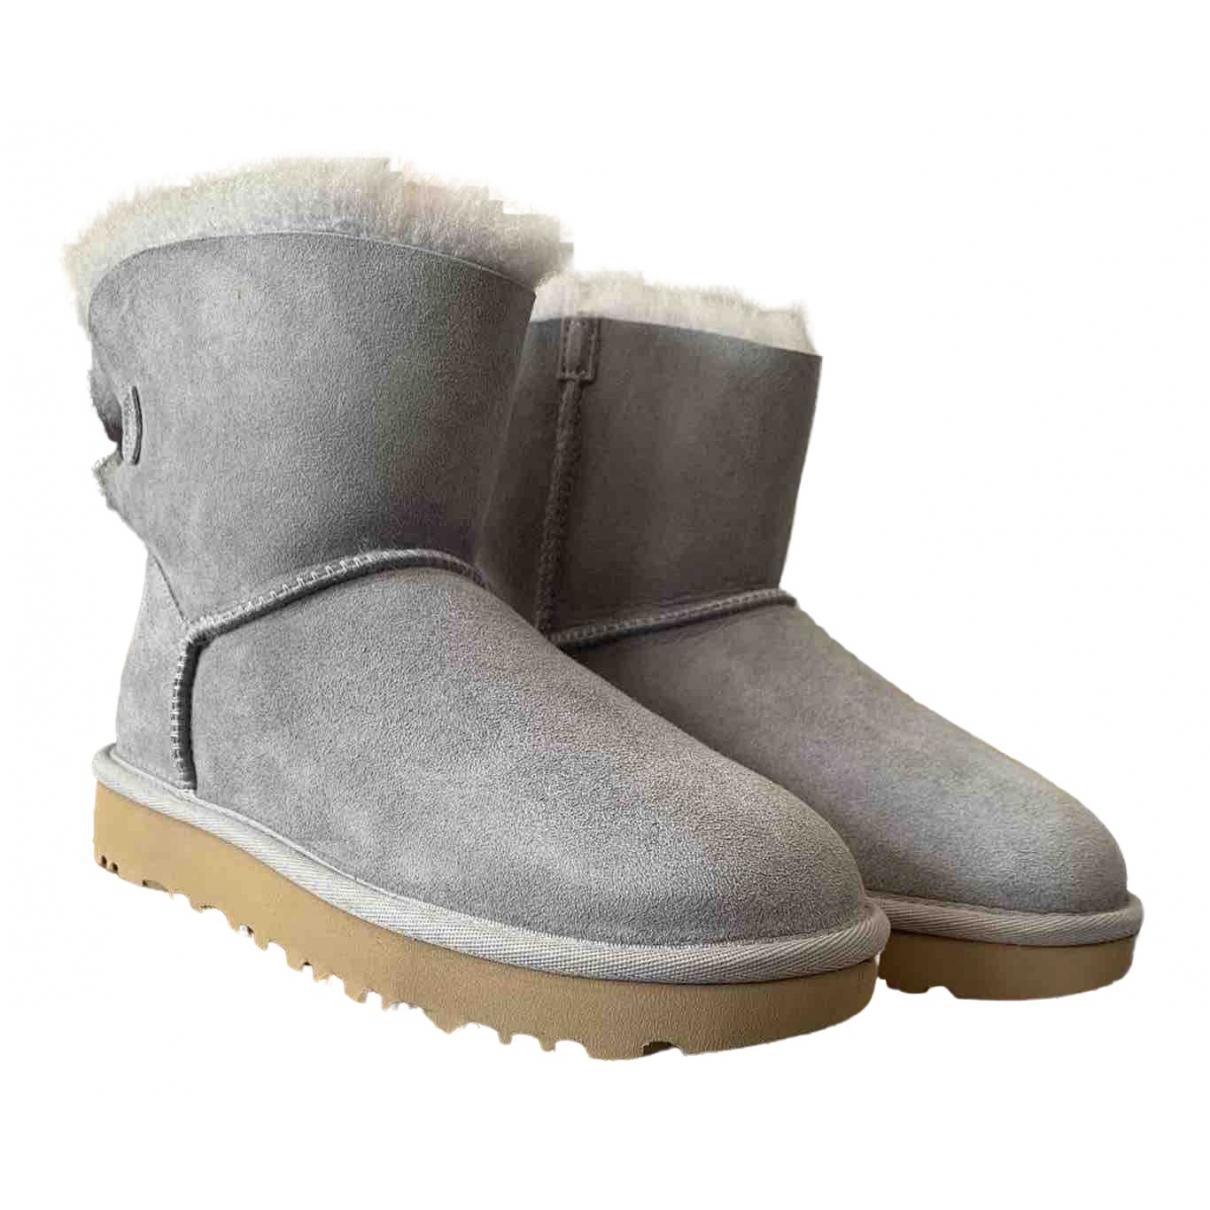 Ugg \N Grey Suede Boots for Women 36 EU